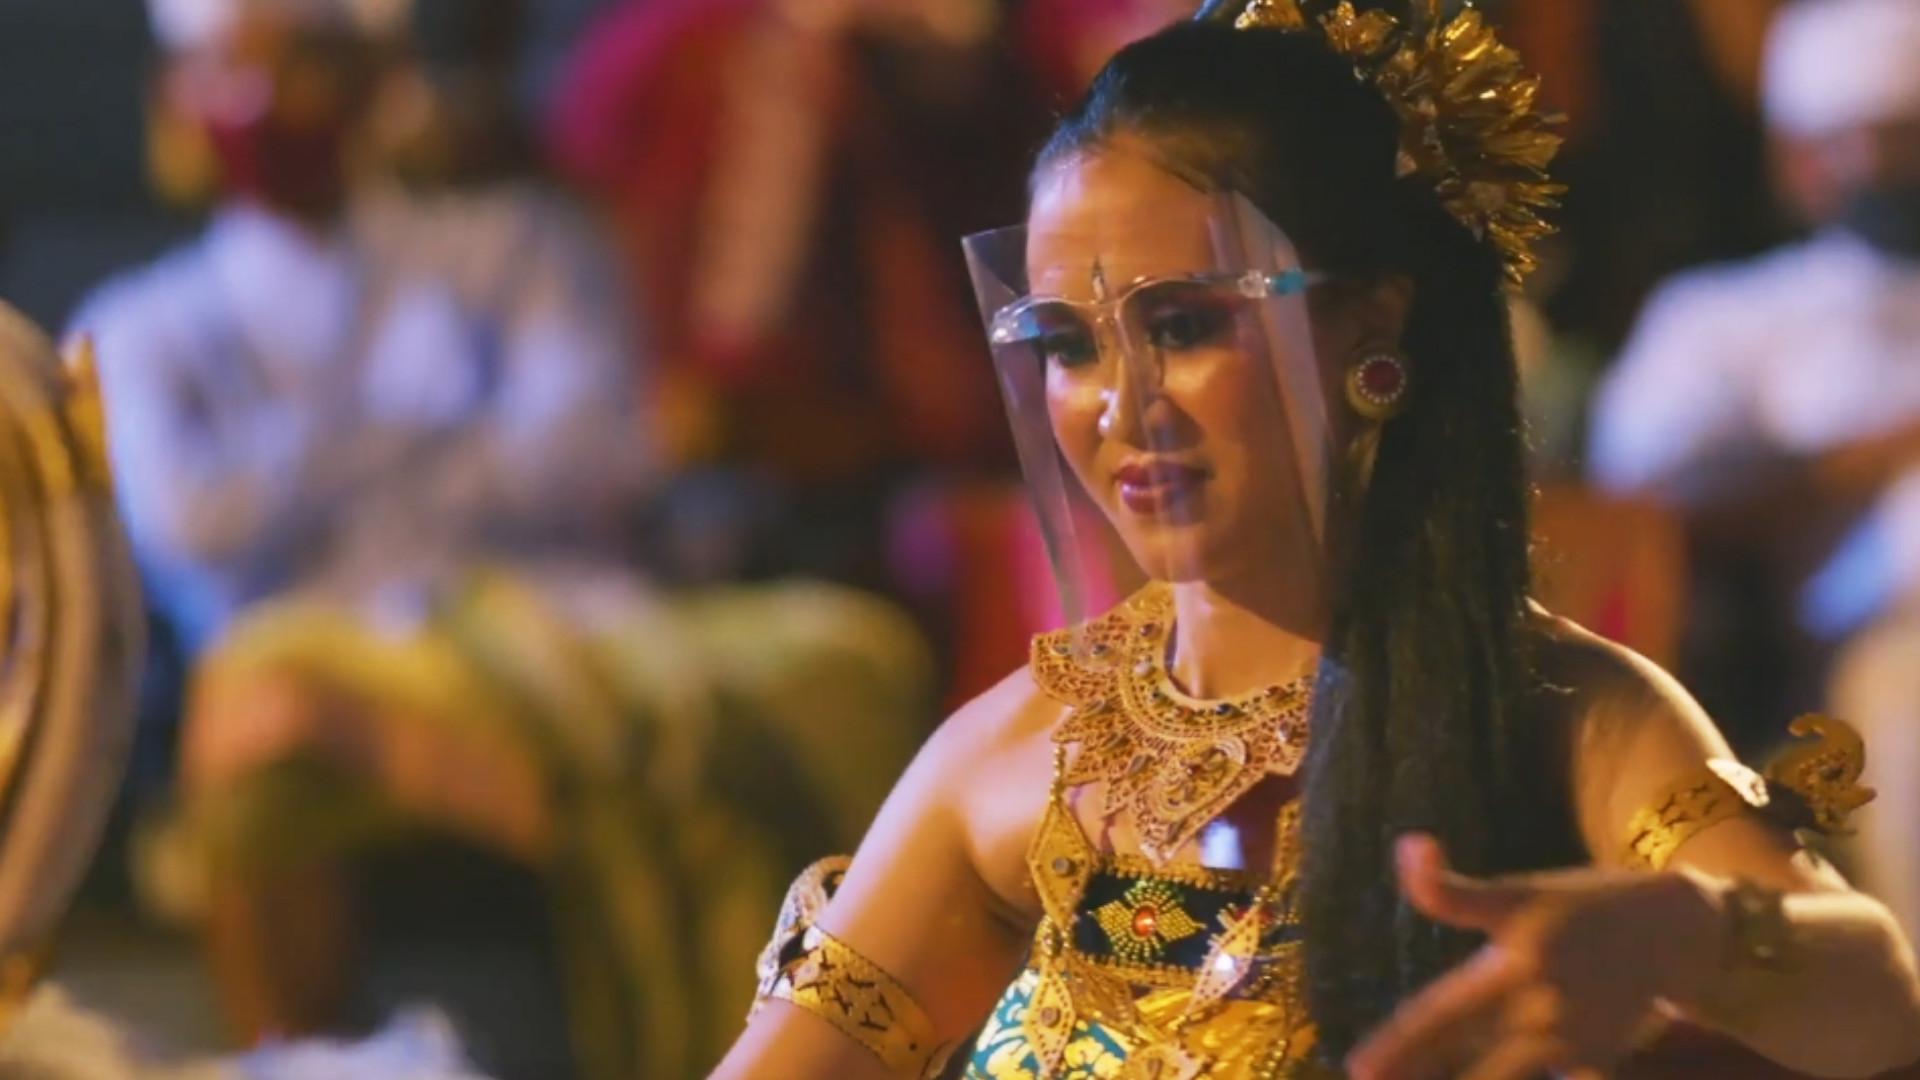 Bali Dance Performance, Dancing with Health Protocol